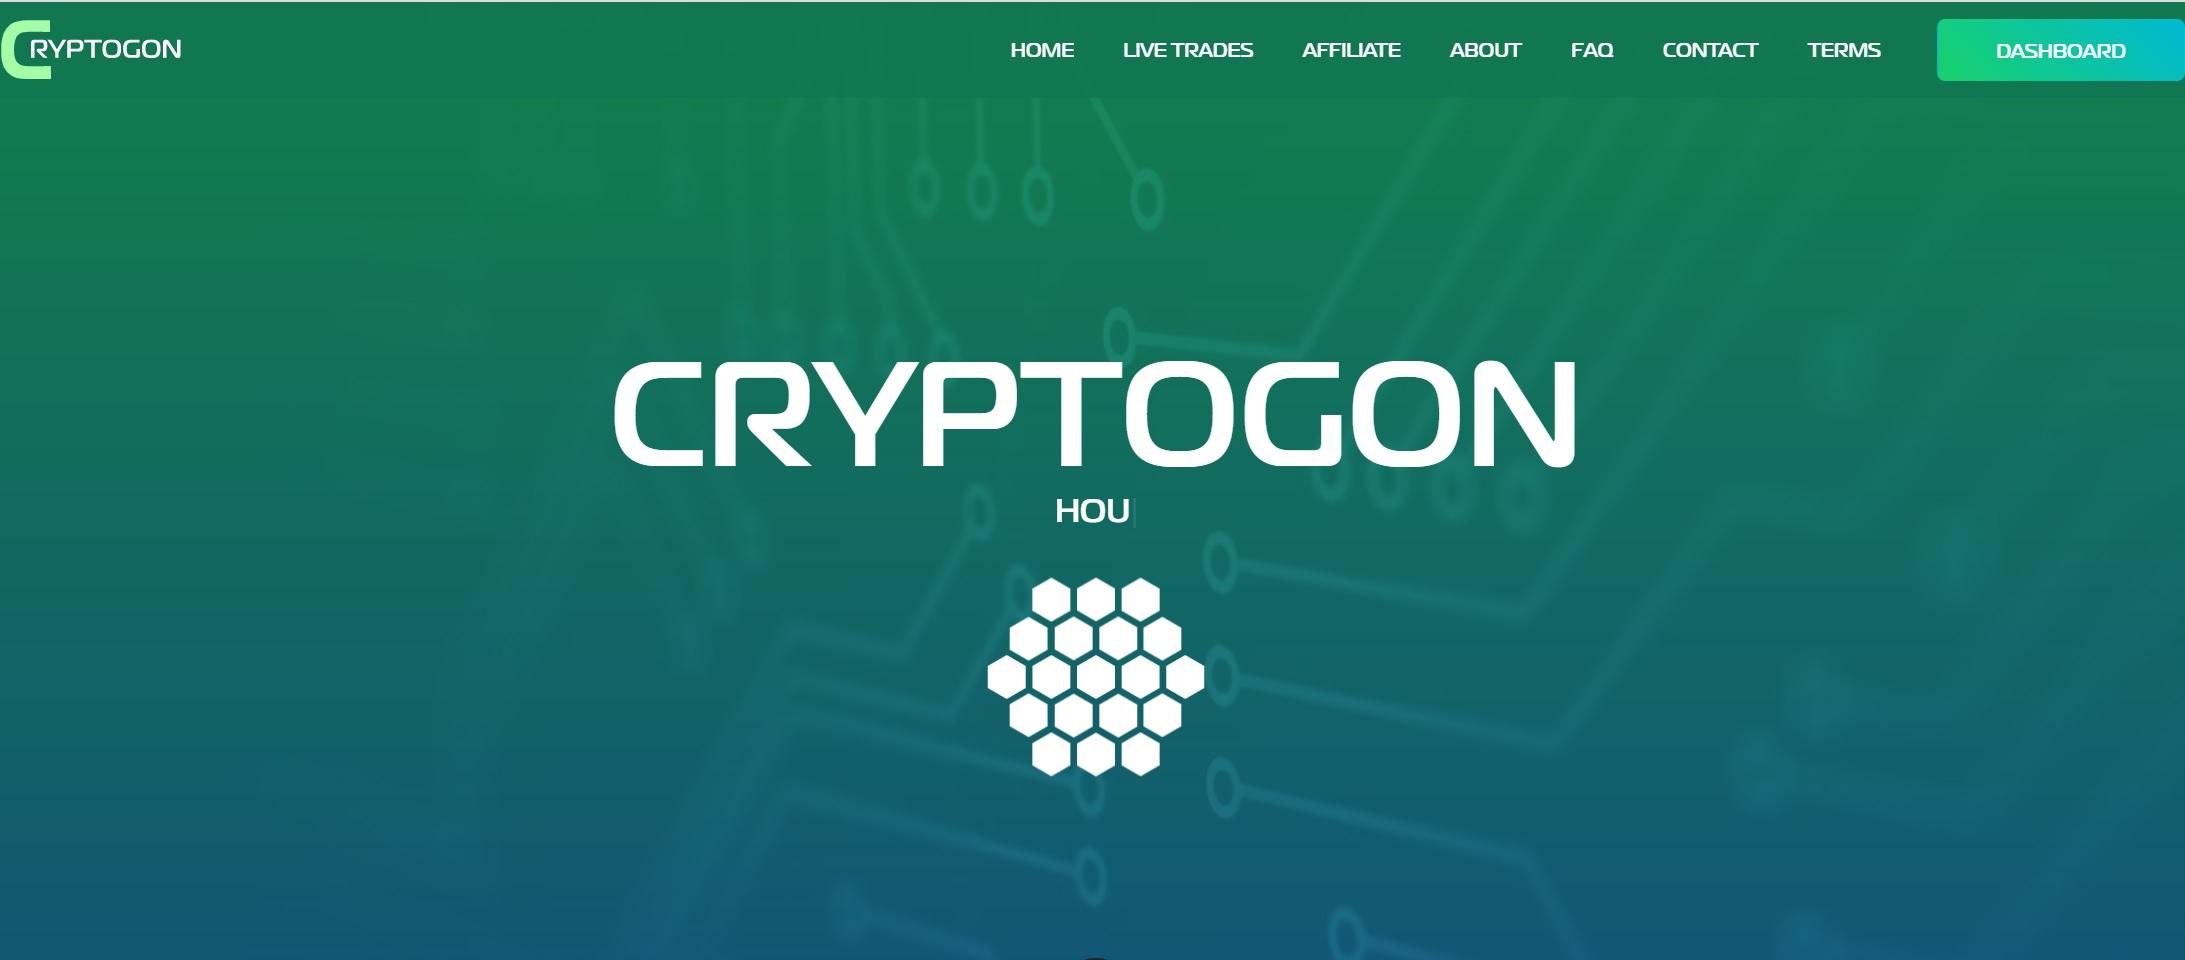 review hyip : cryptogon.io